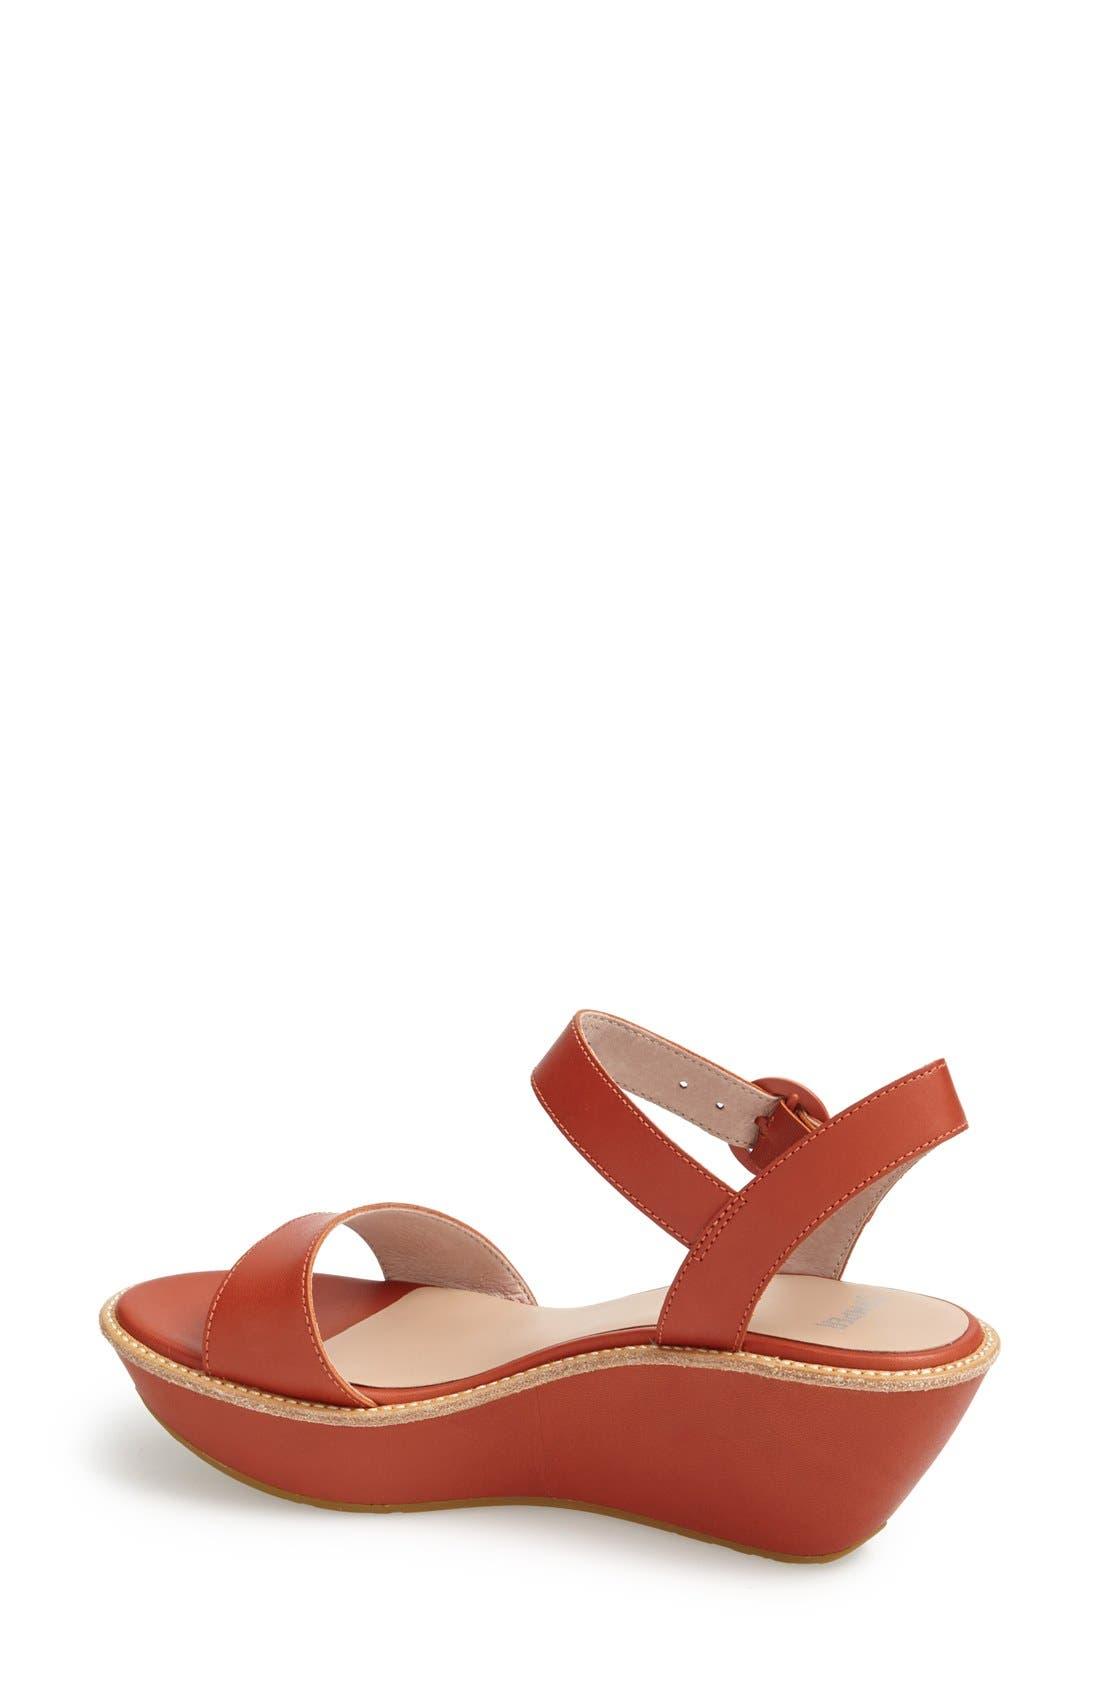 'Damas' Wedge Sandal,                             Alternate thumbnail 24, color,